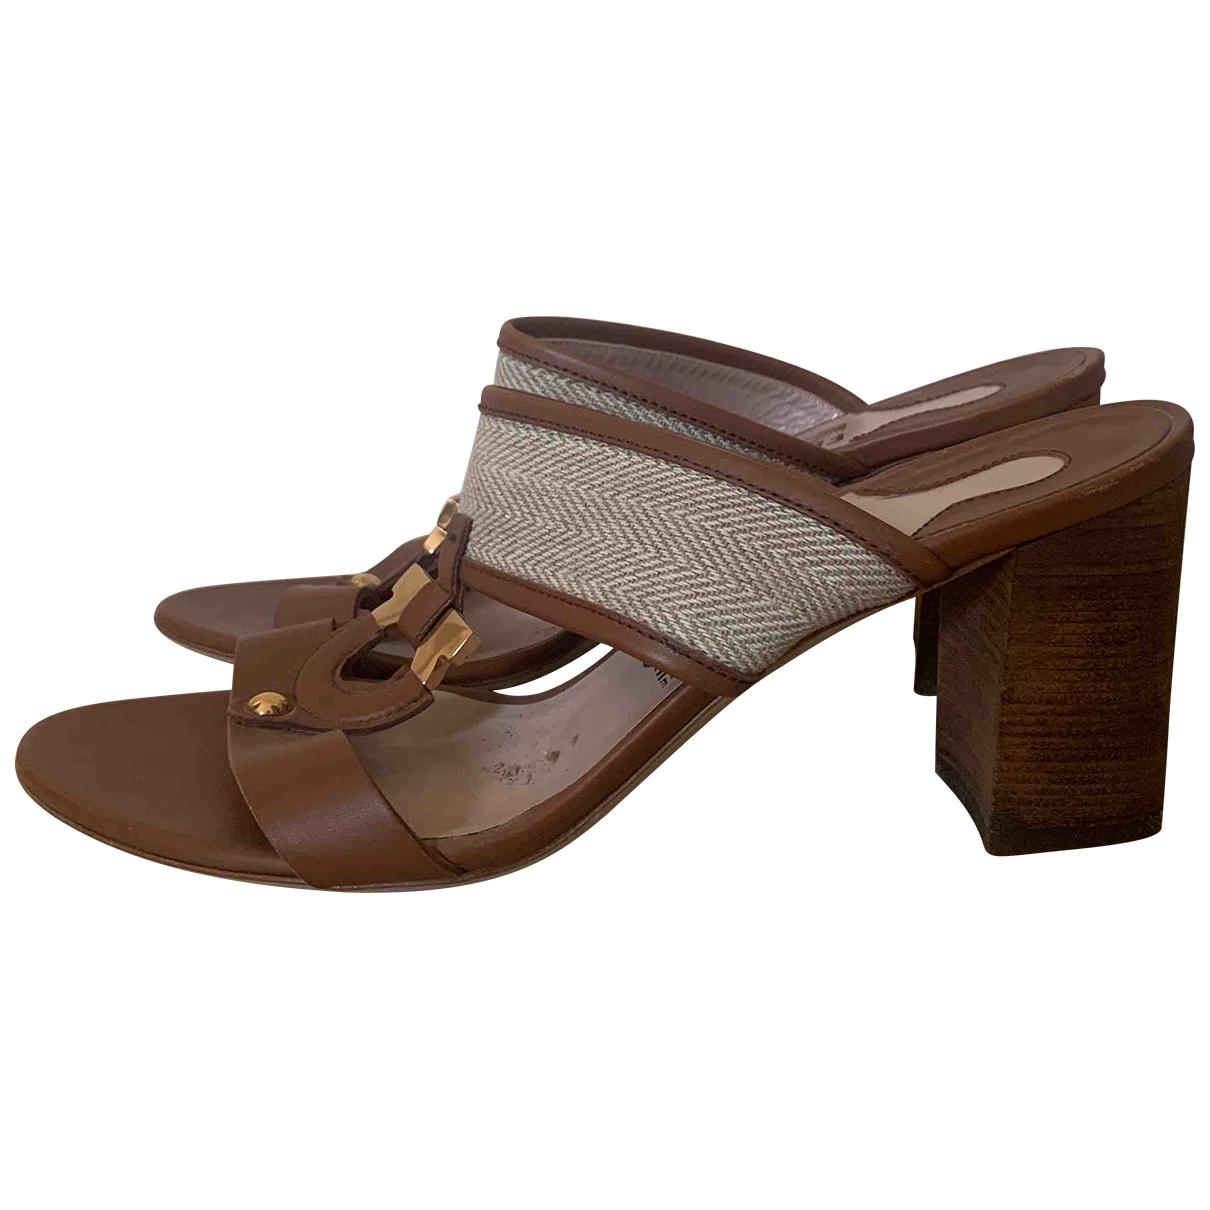 Salvatore Ferragamo \N Brown Leather Sandals for Women 38 IT